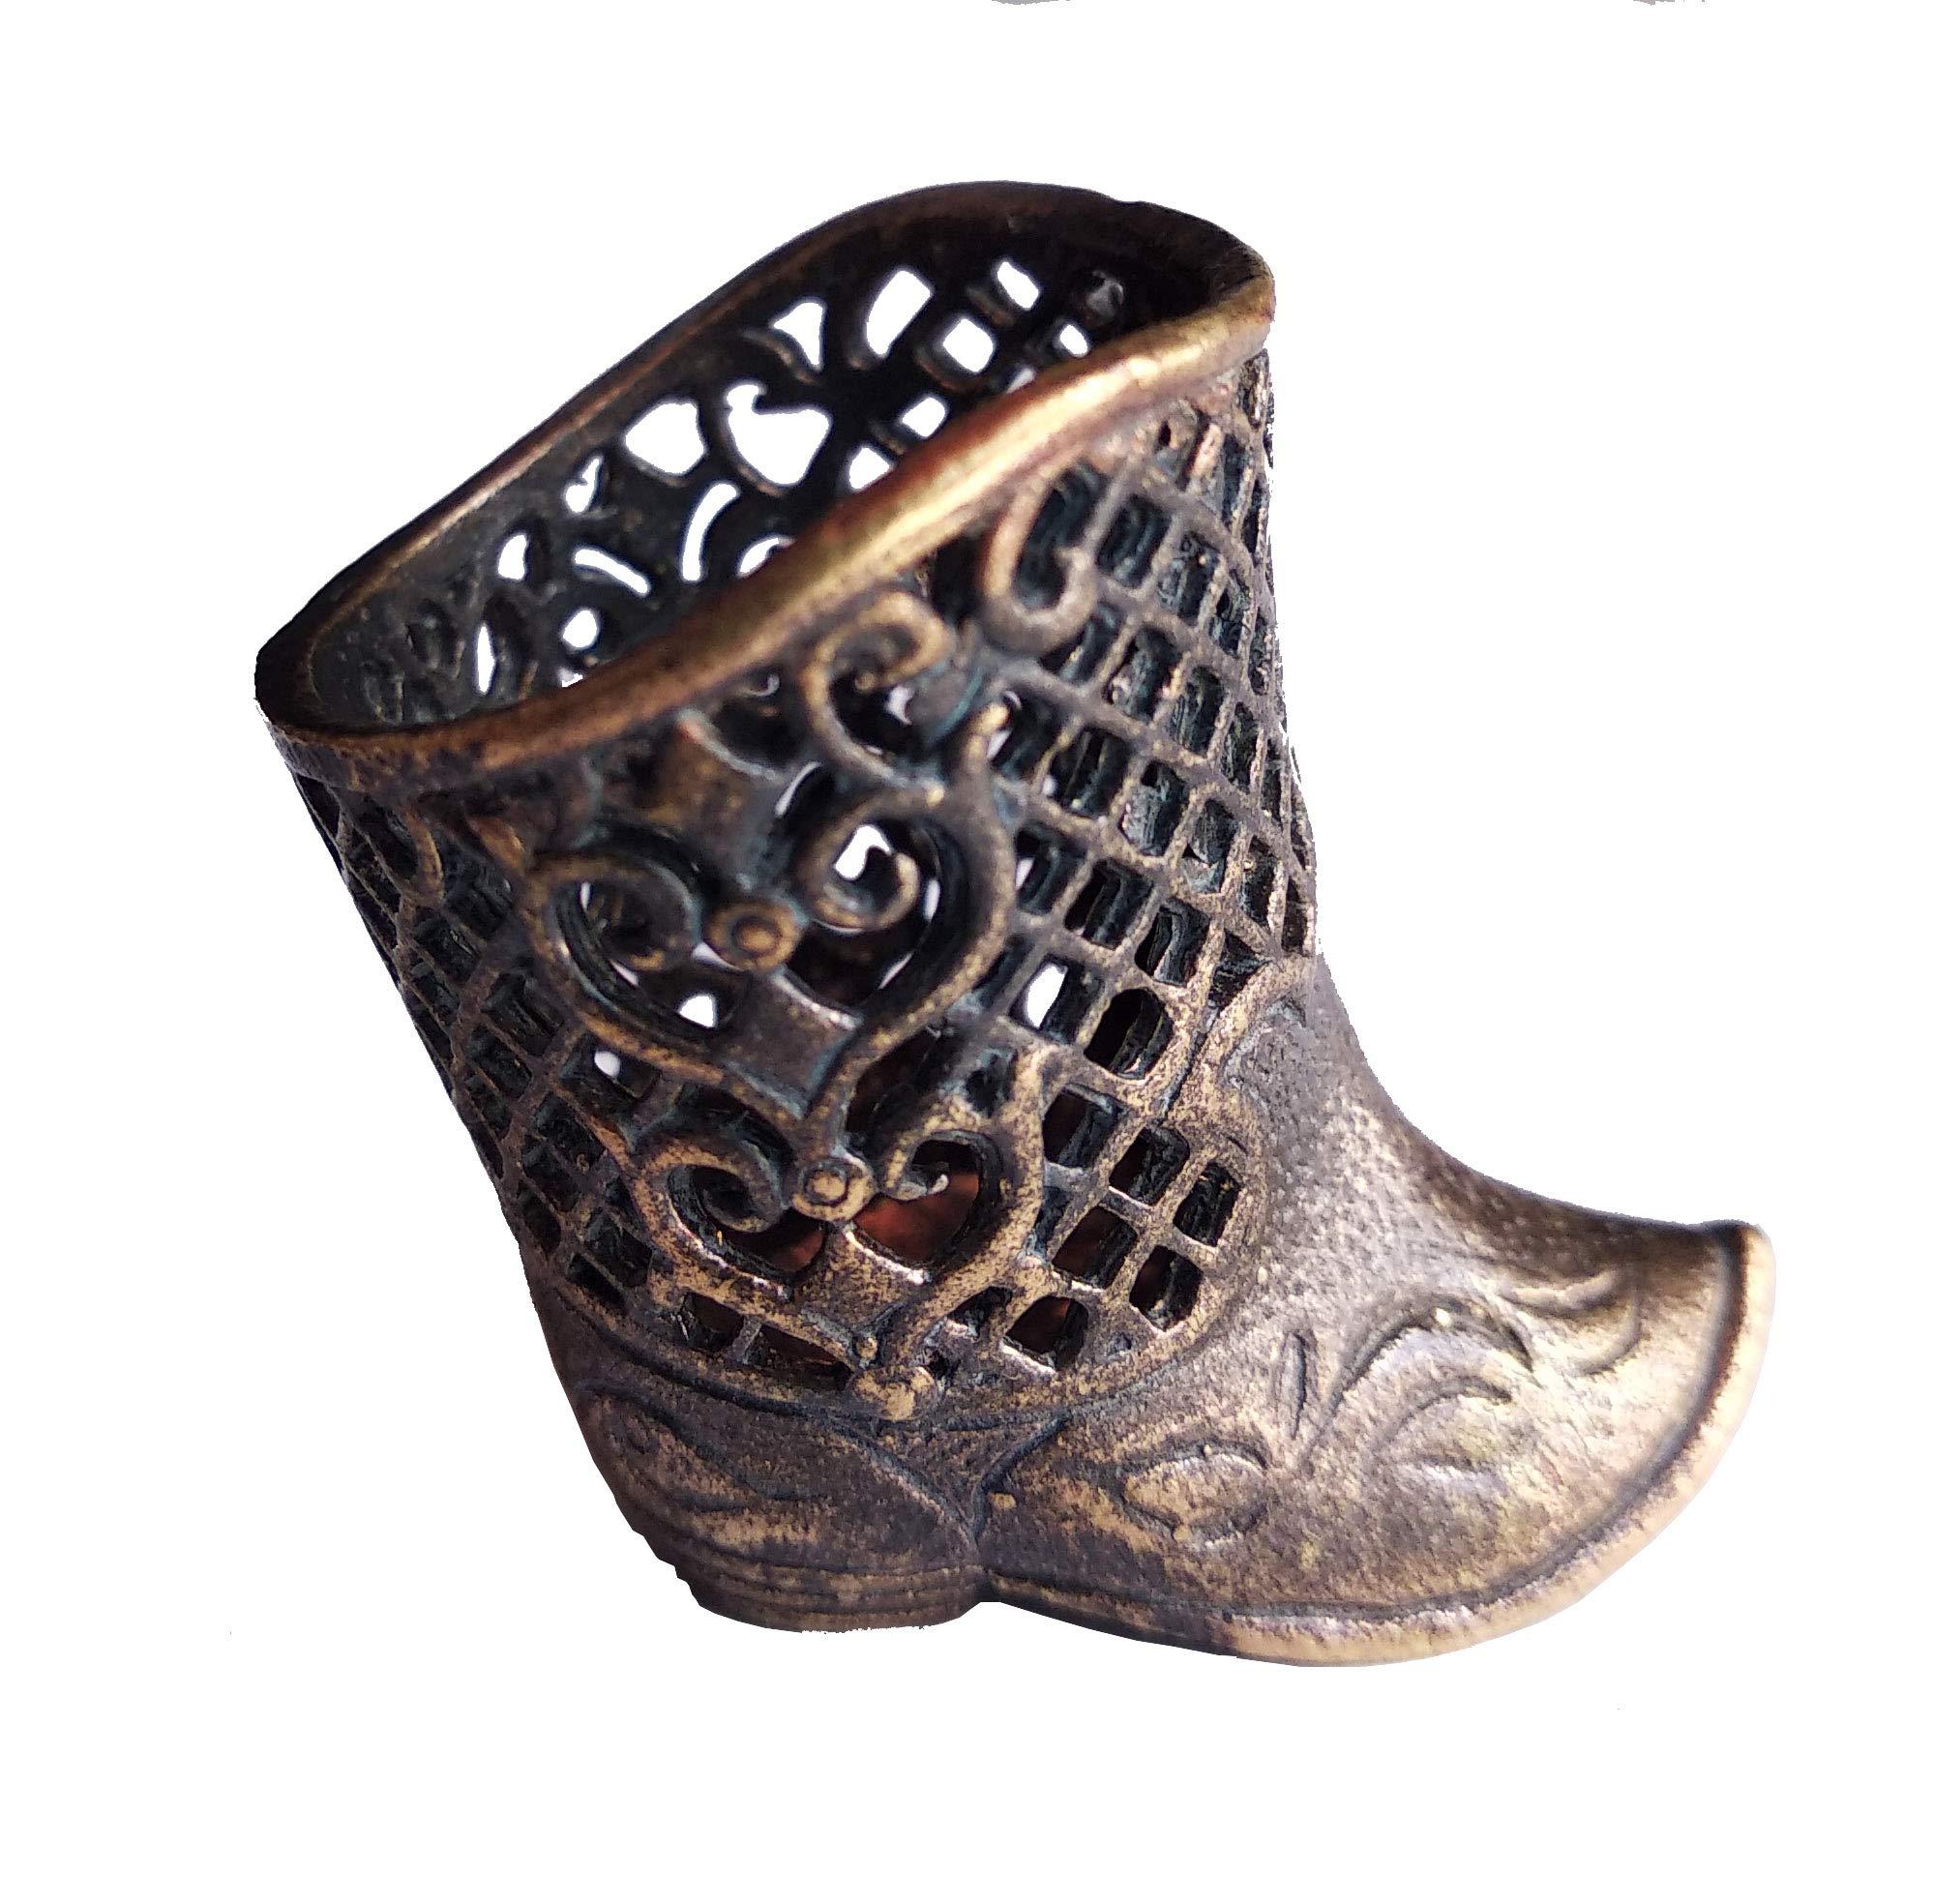 Collectible Thimble Bronze Boots Chinggis Khaan - Souvenir Thimbles in a Burlap Bag by Warm me Doll